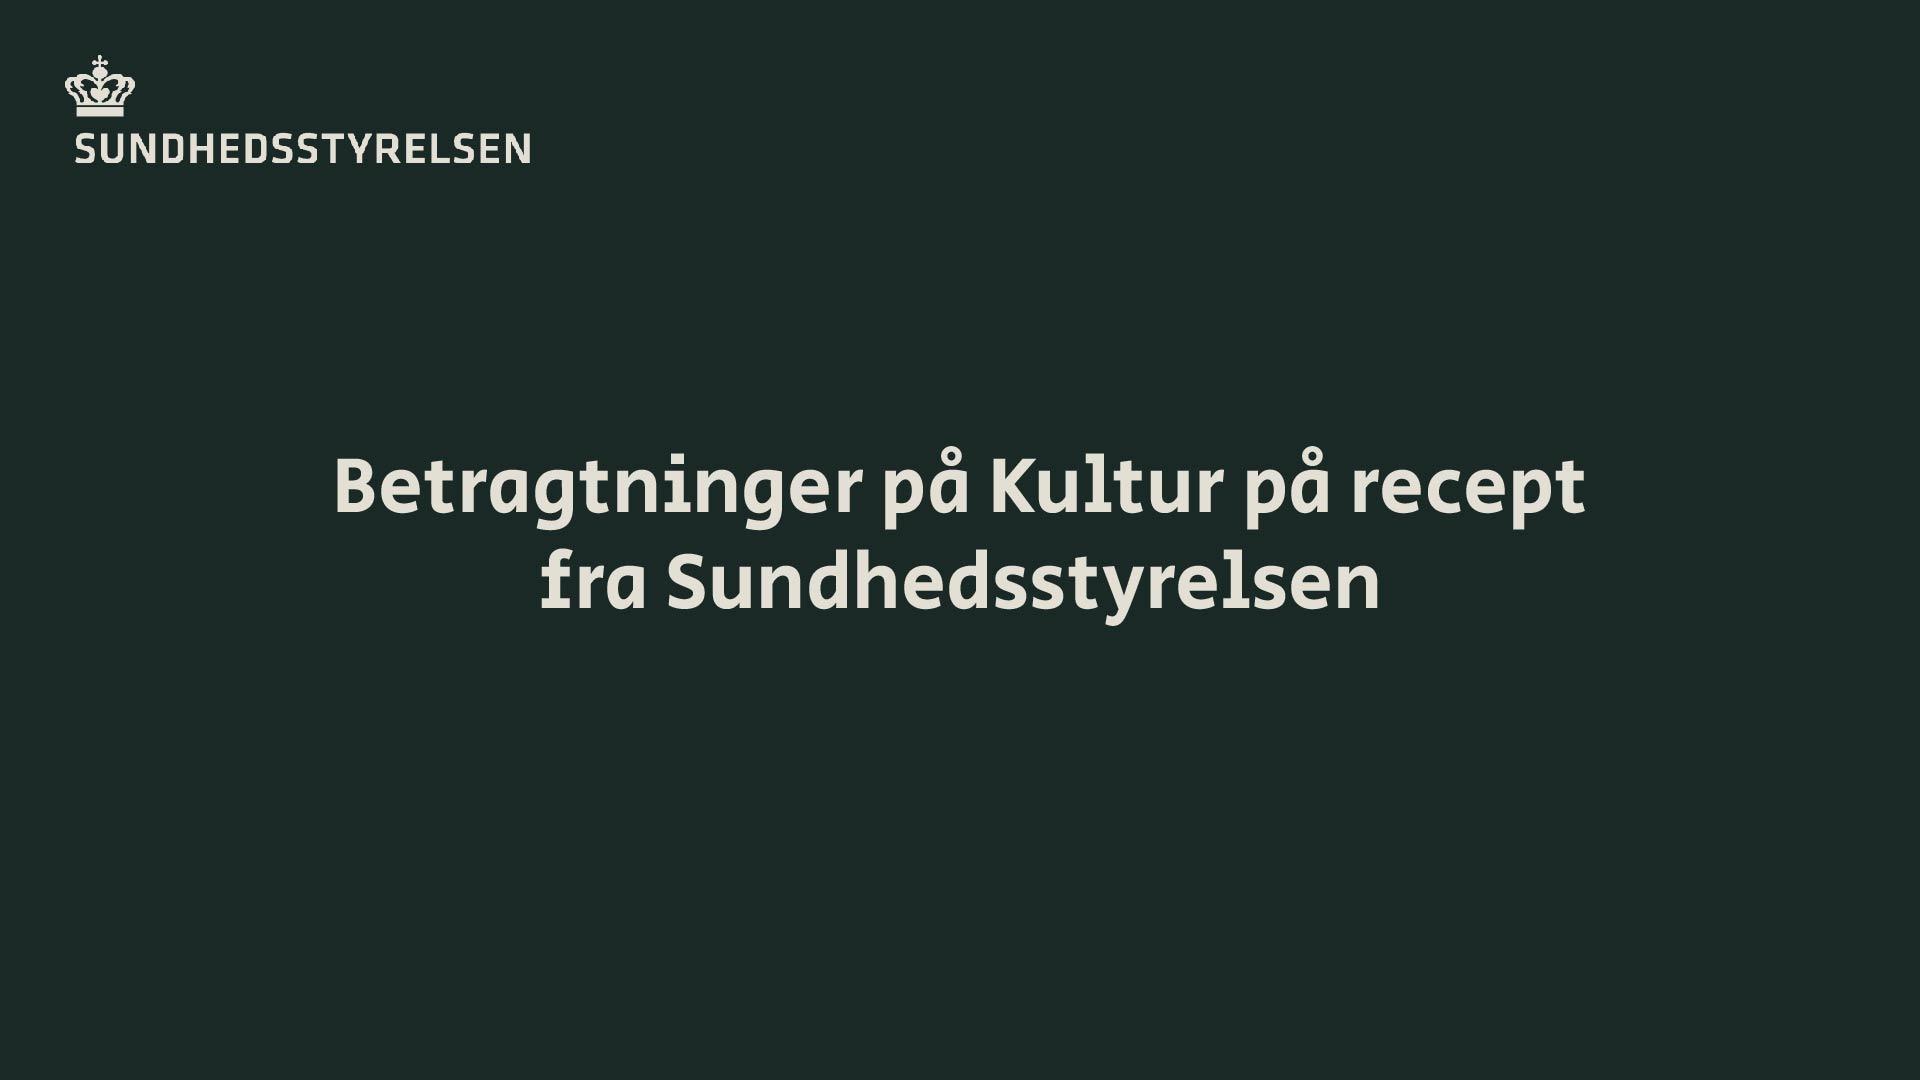 Søren Brostrøm